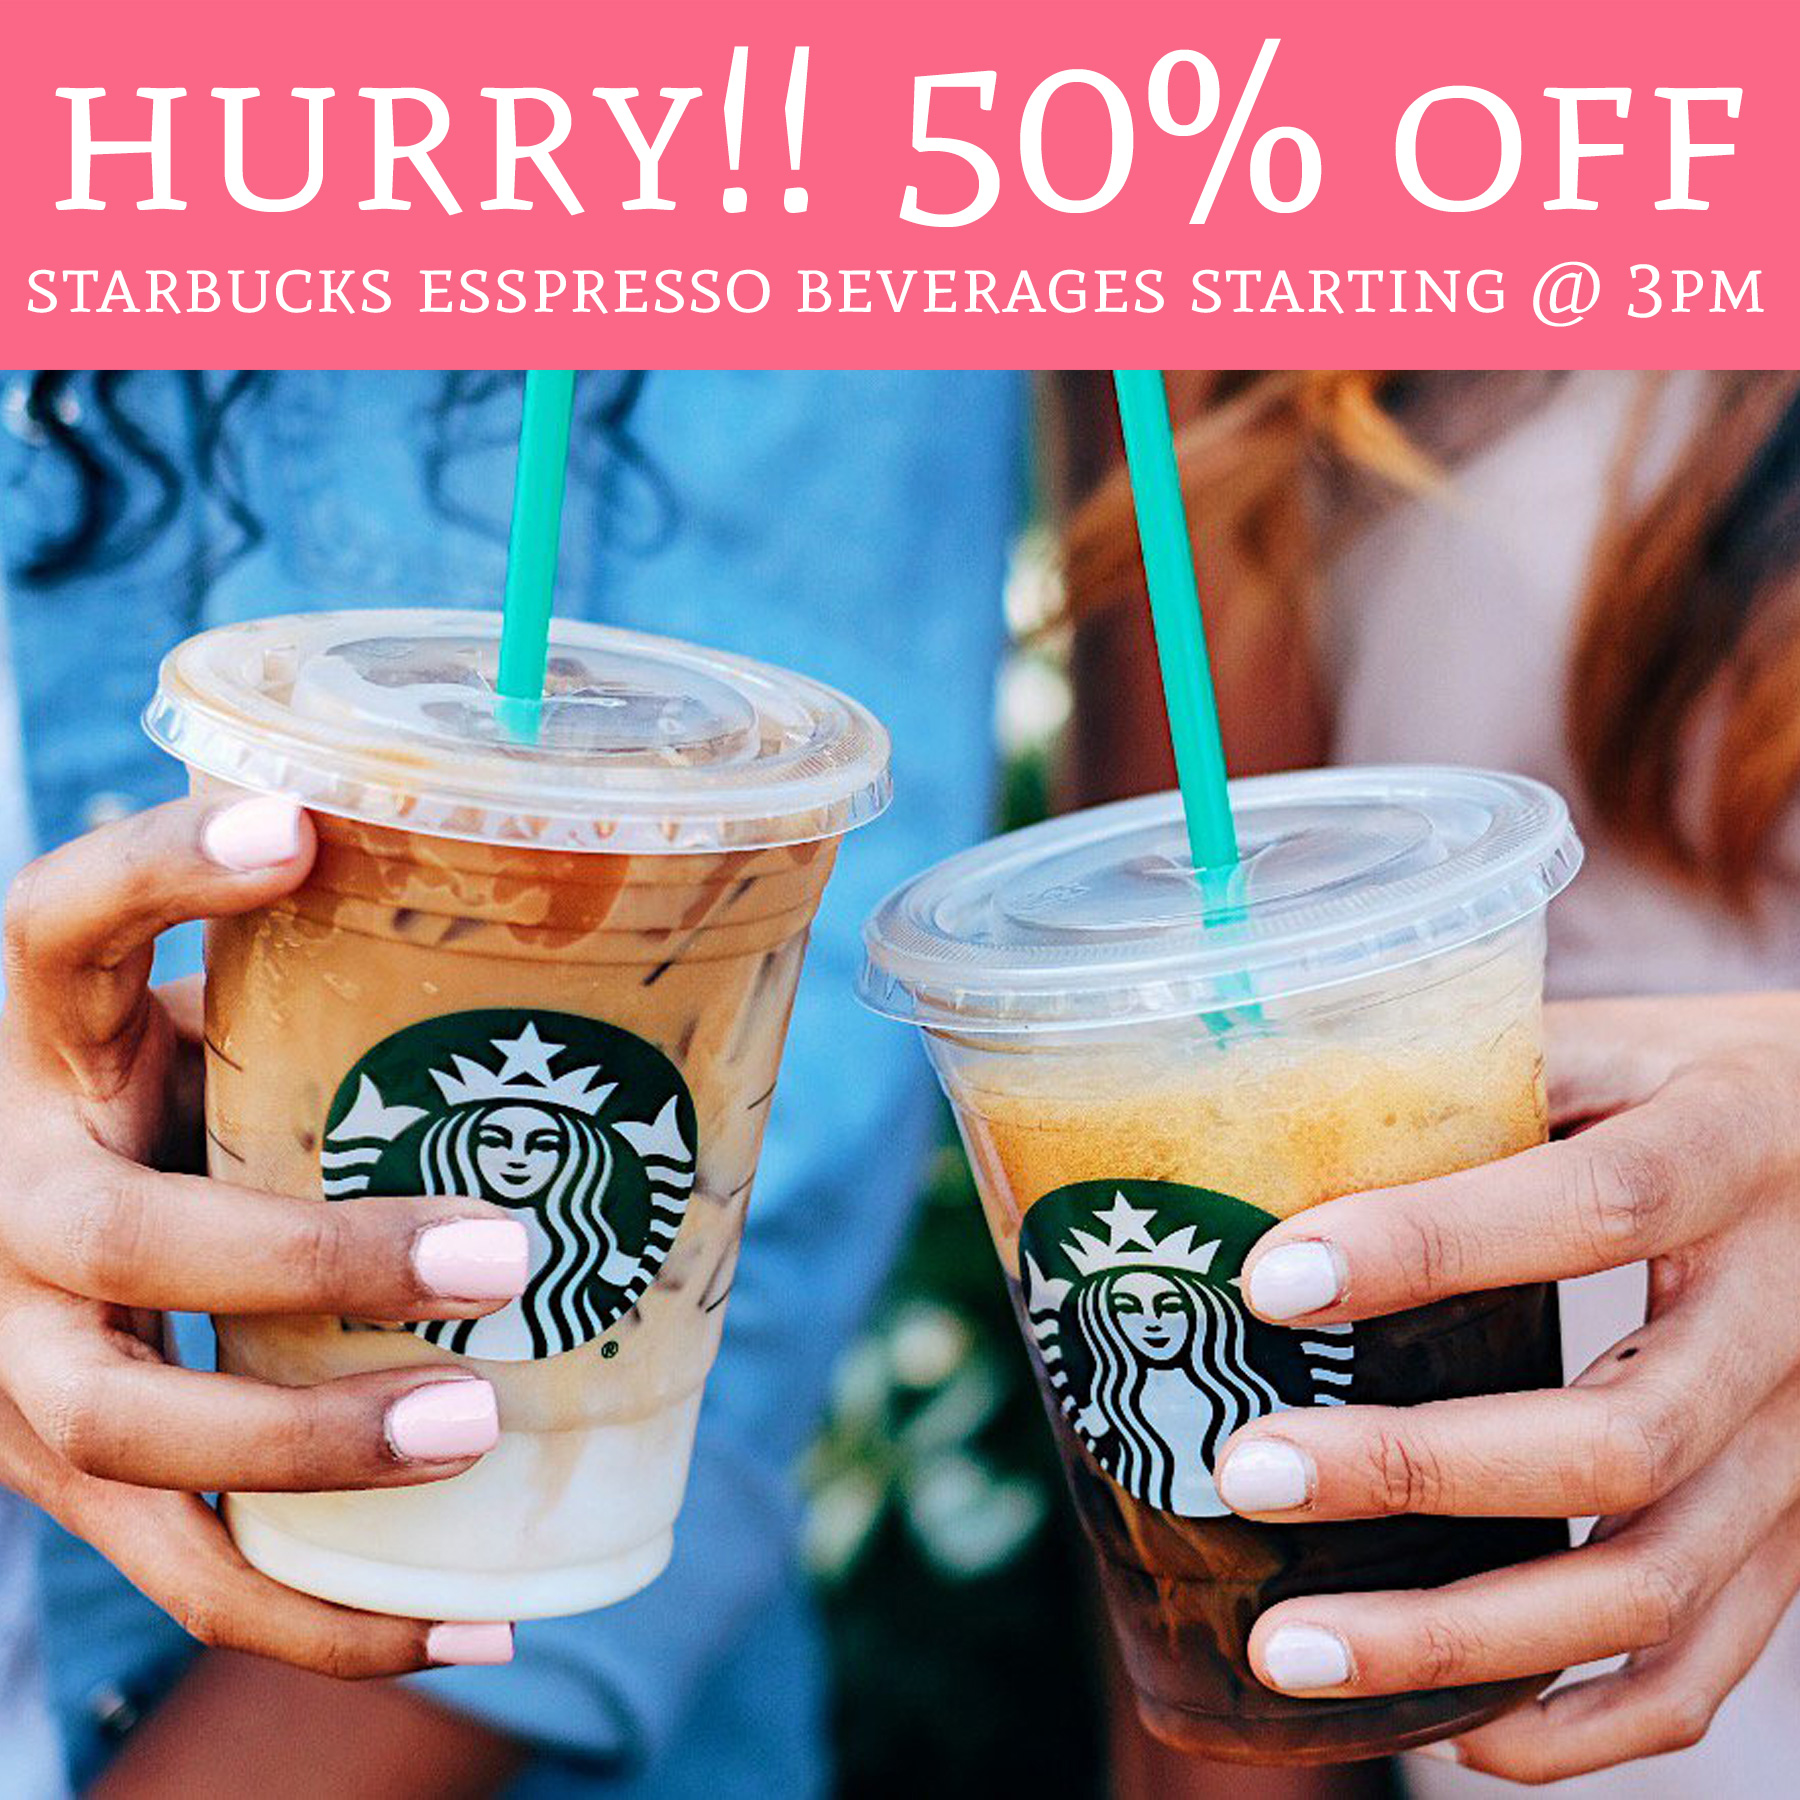 HOT! 50% Off Starbucks Espresso Beverages Starting @ 3pm